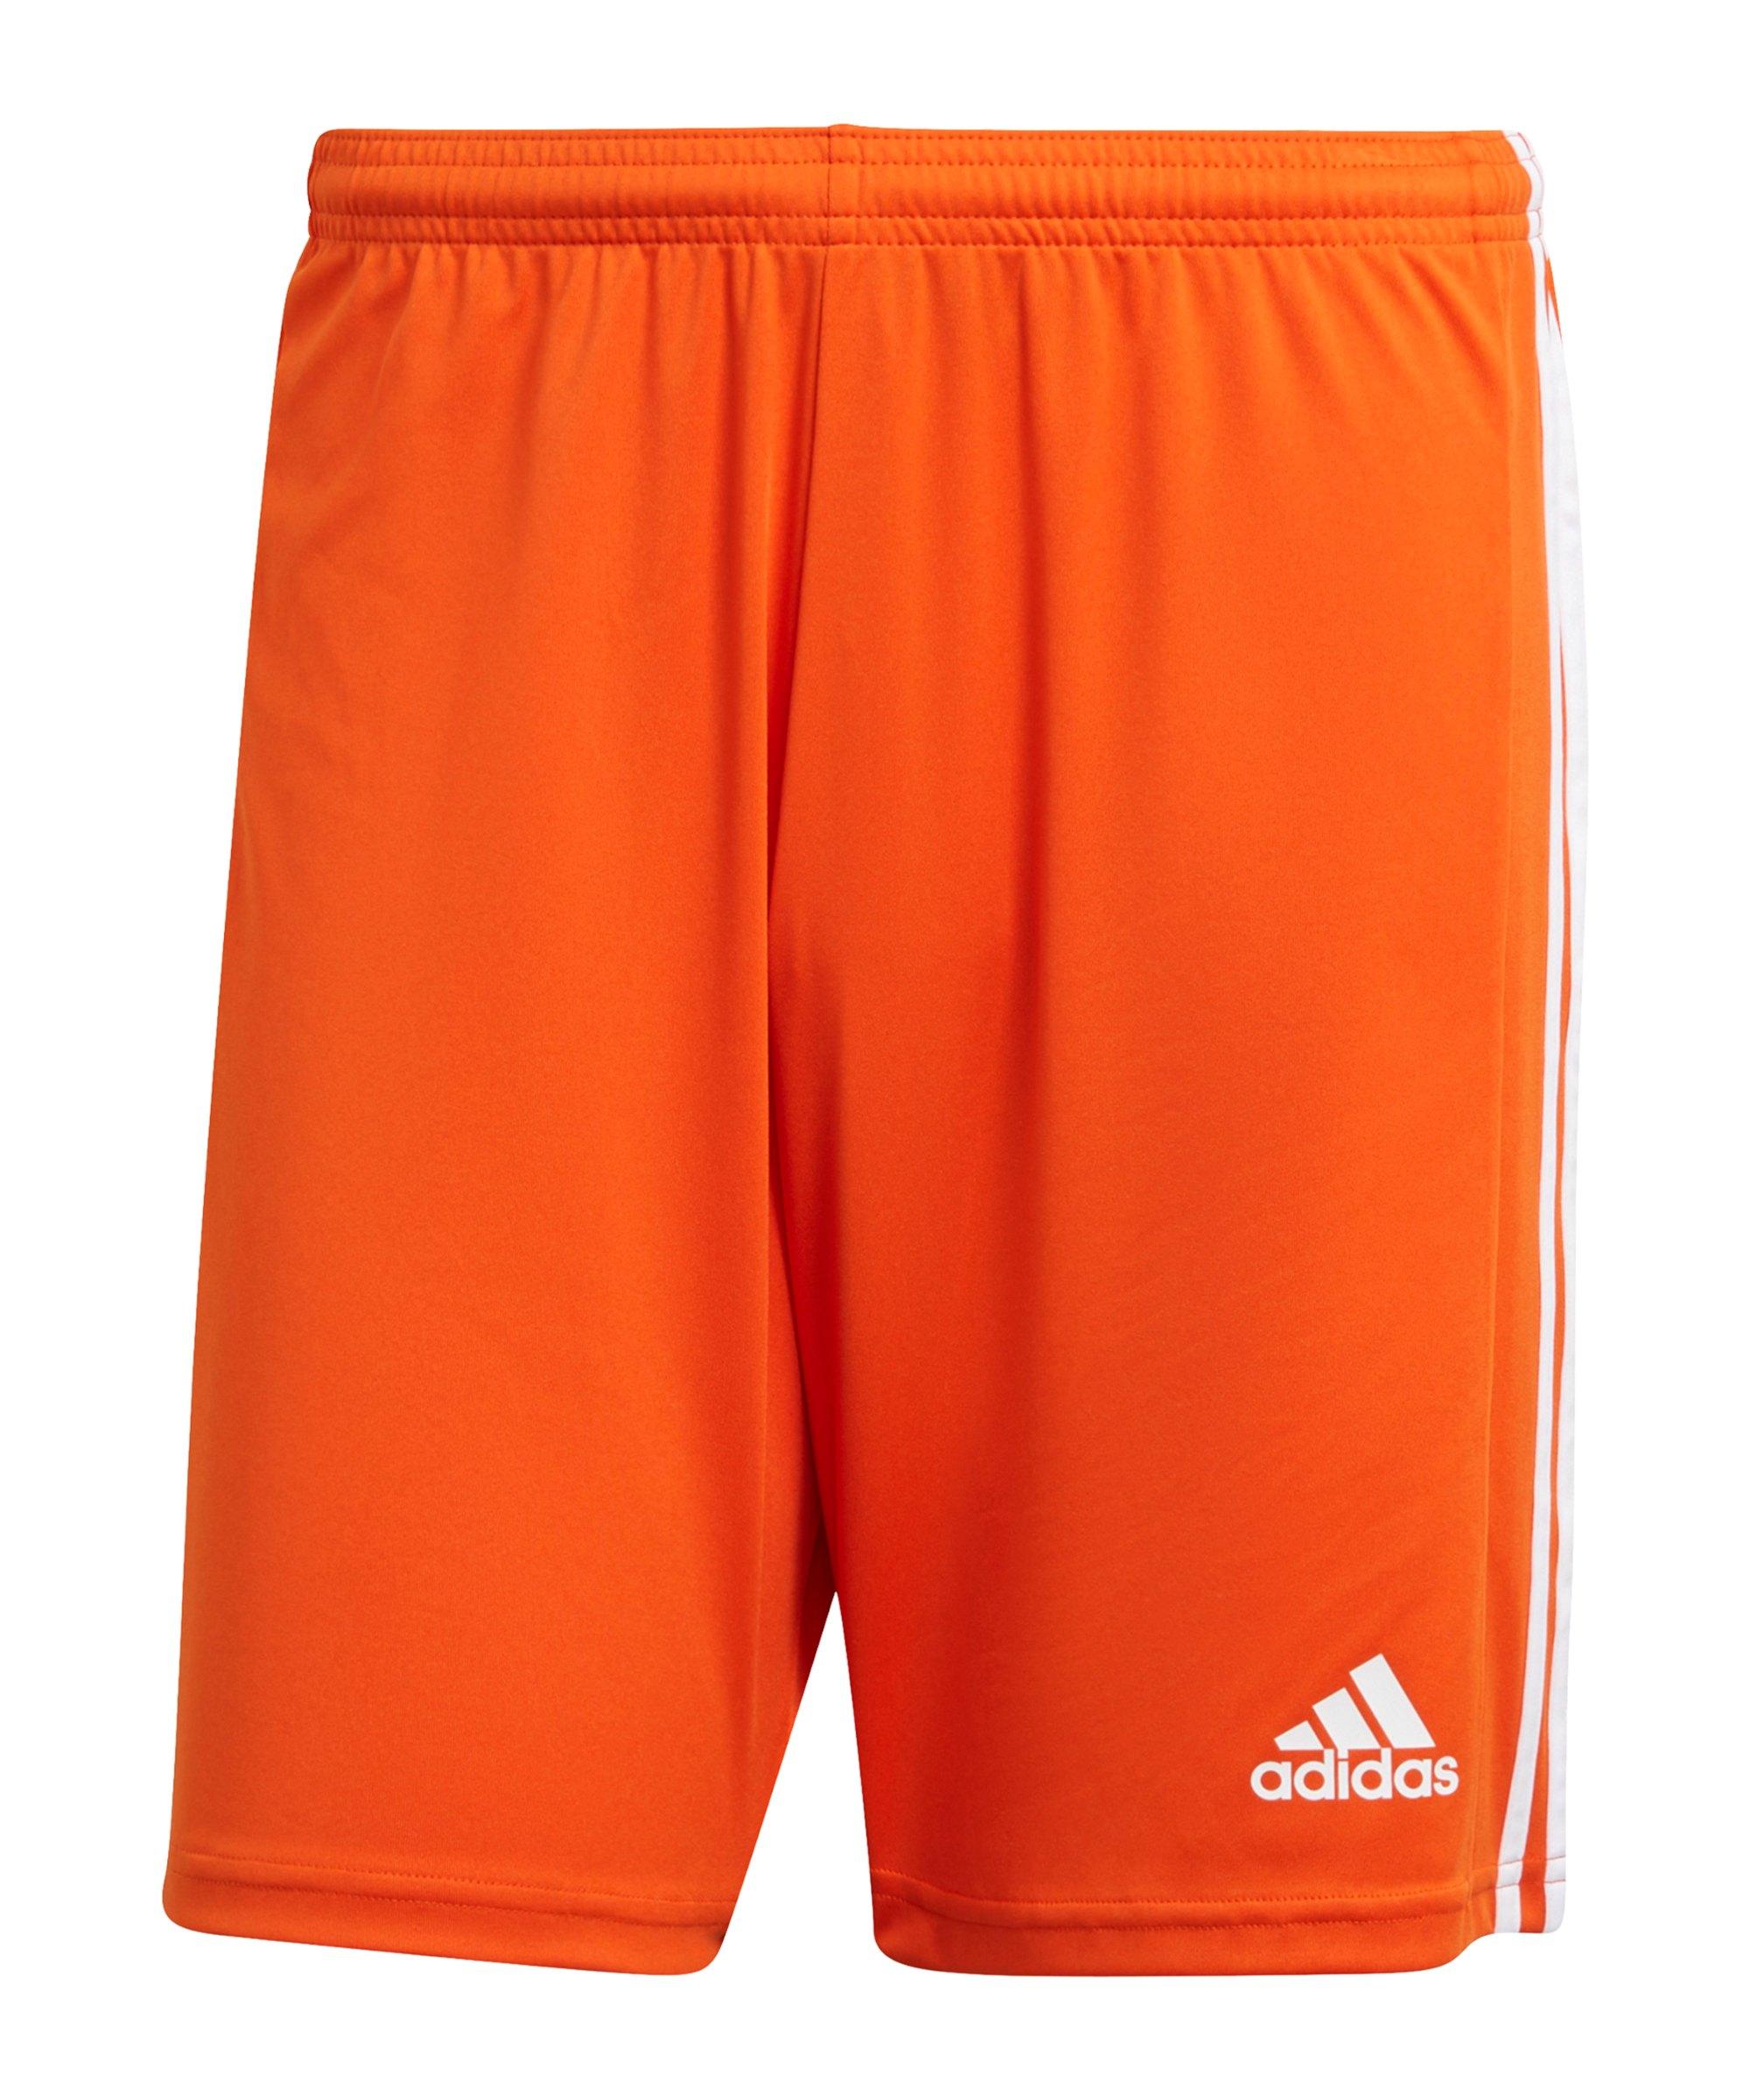 adidas Squadra 21 Short Orange Weiss - orange